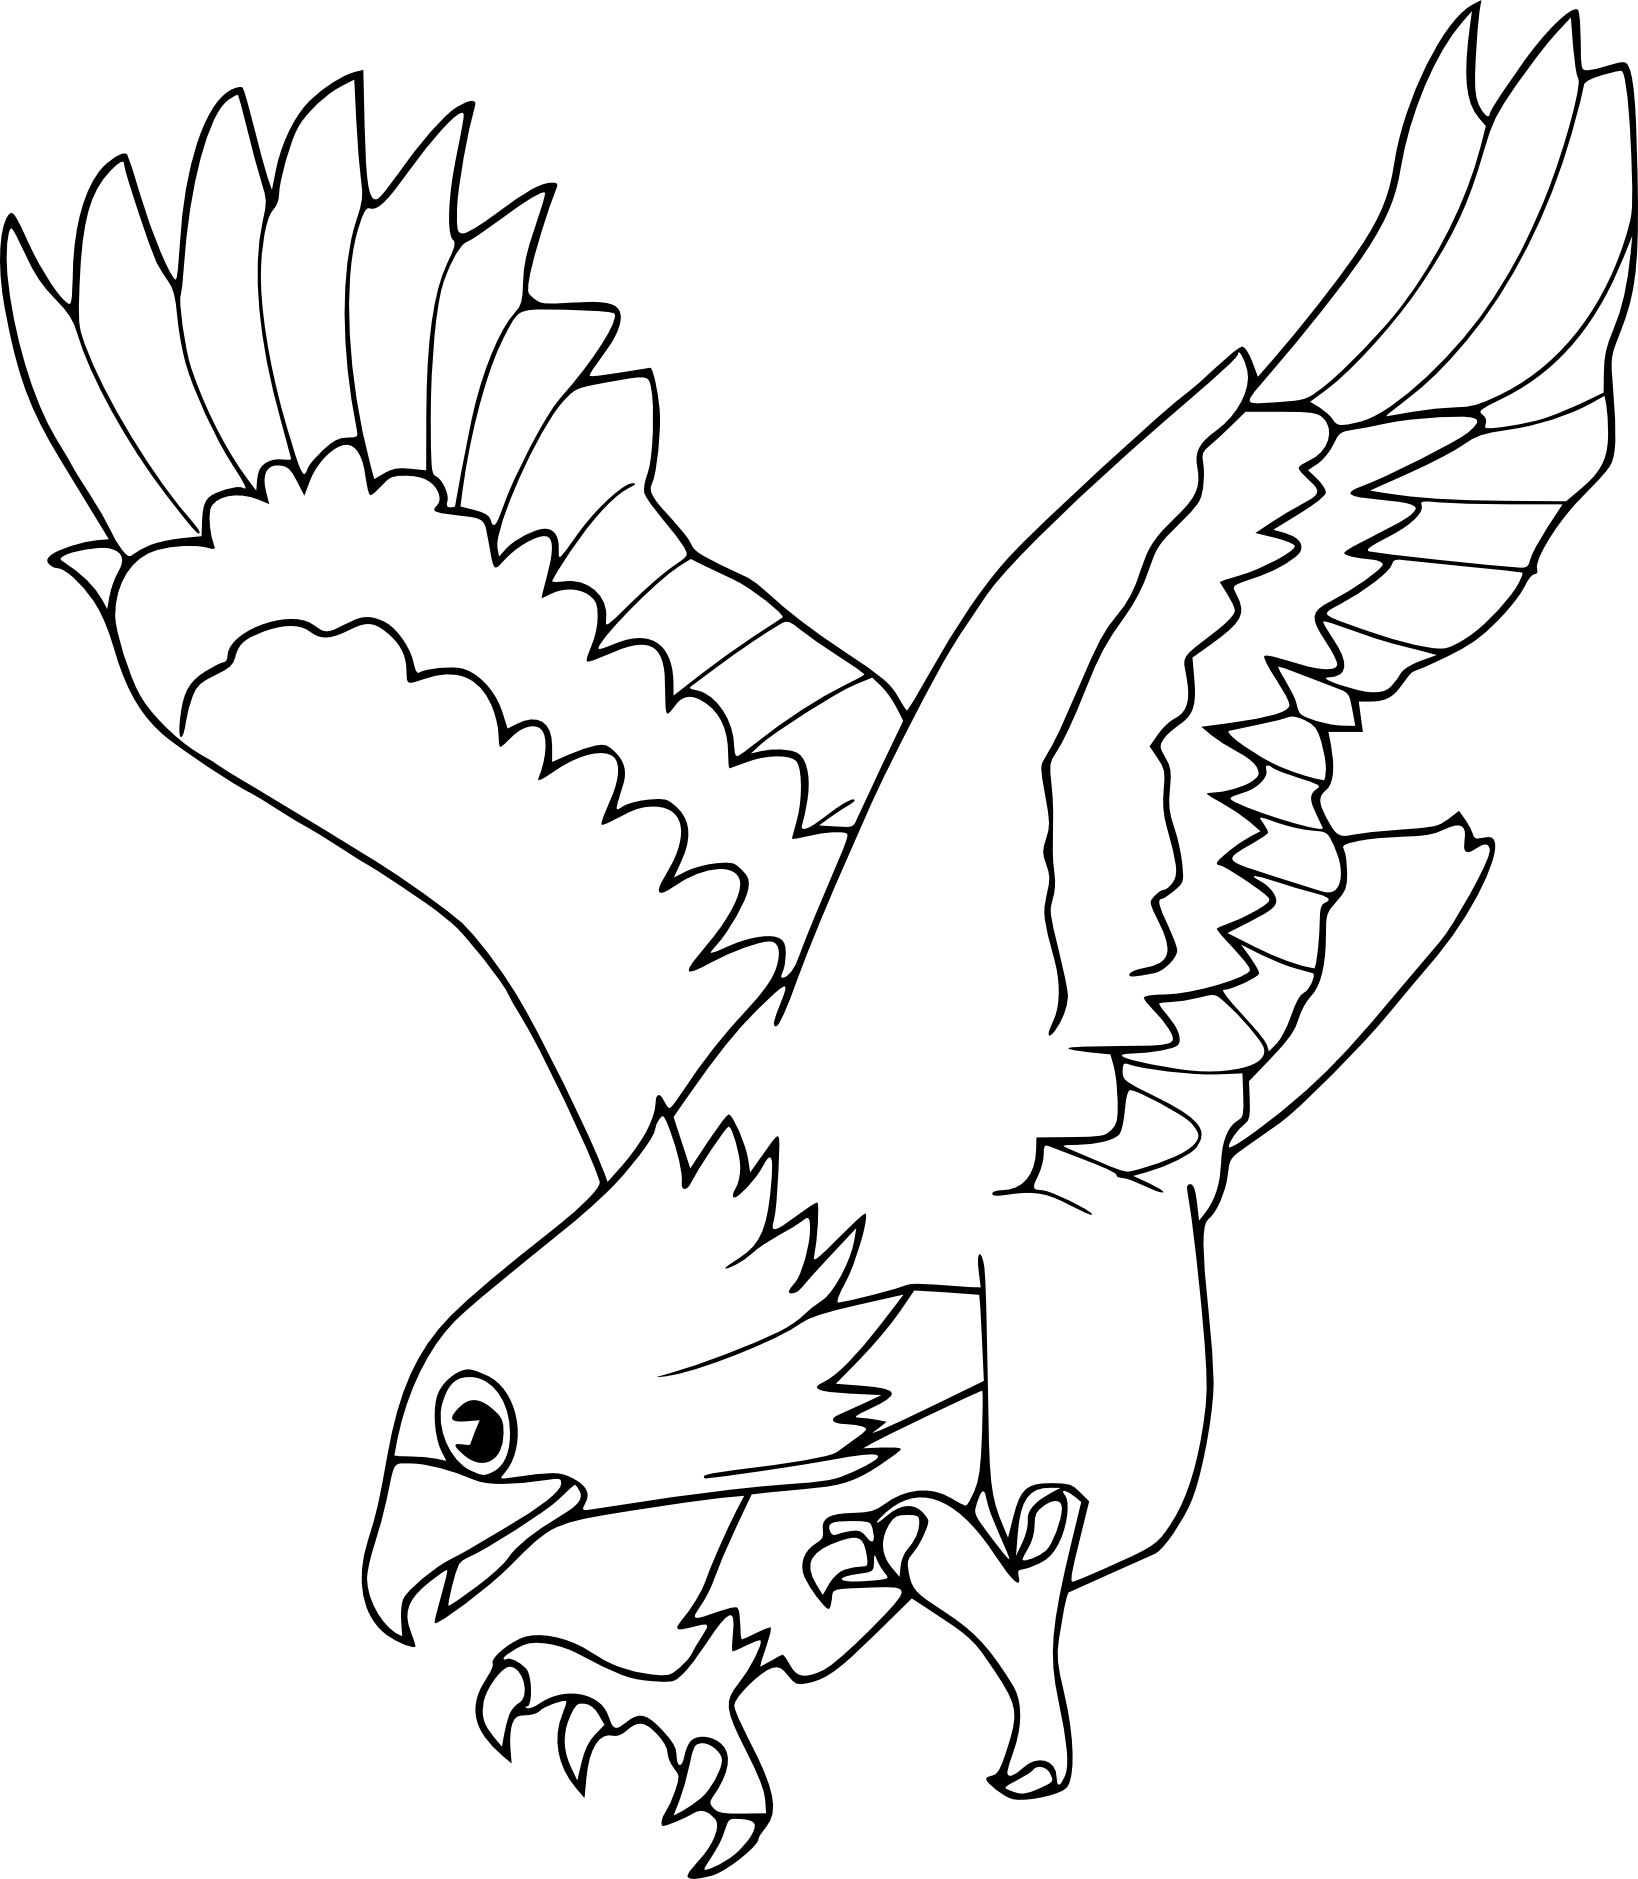 Coloriage aigle royale